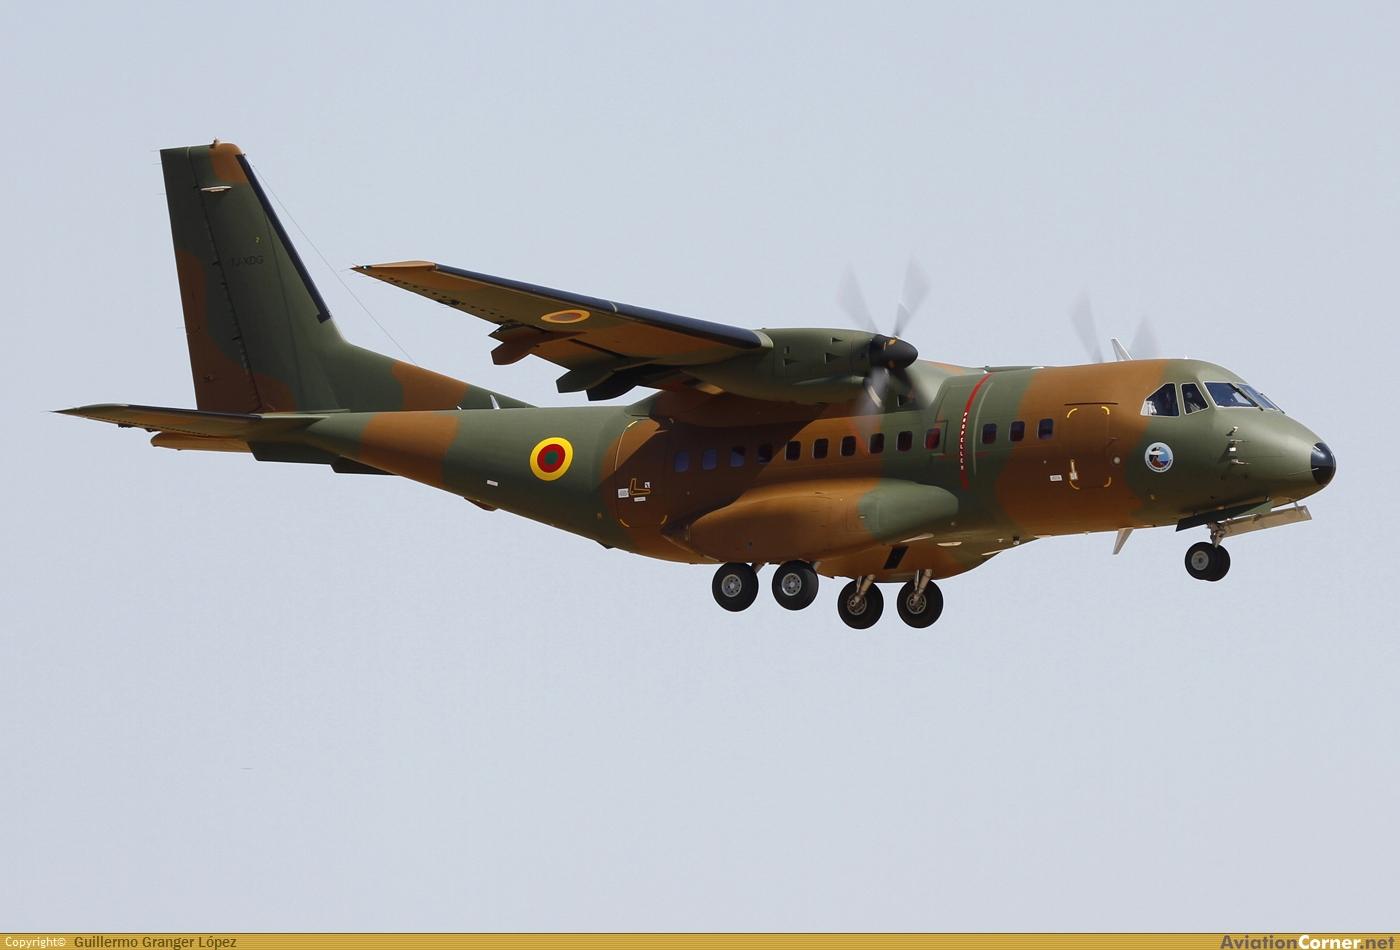 Forces Armées Camerounaises - Page 2 Avc_00311259